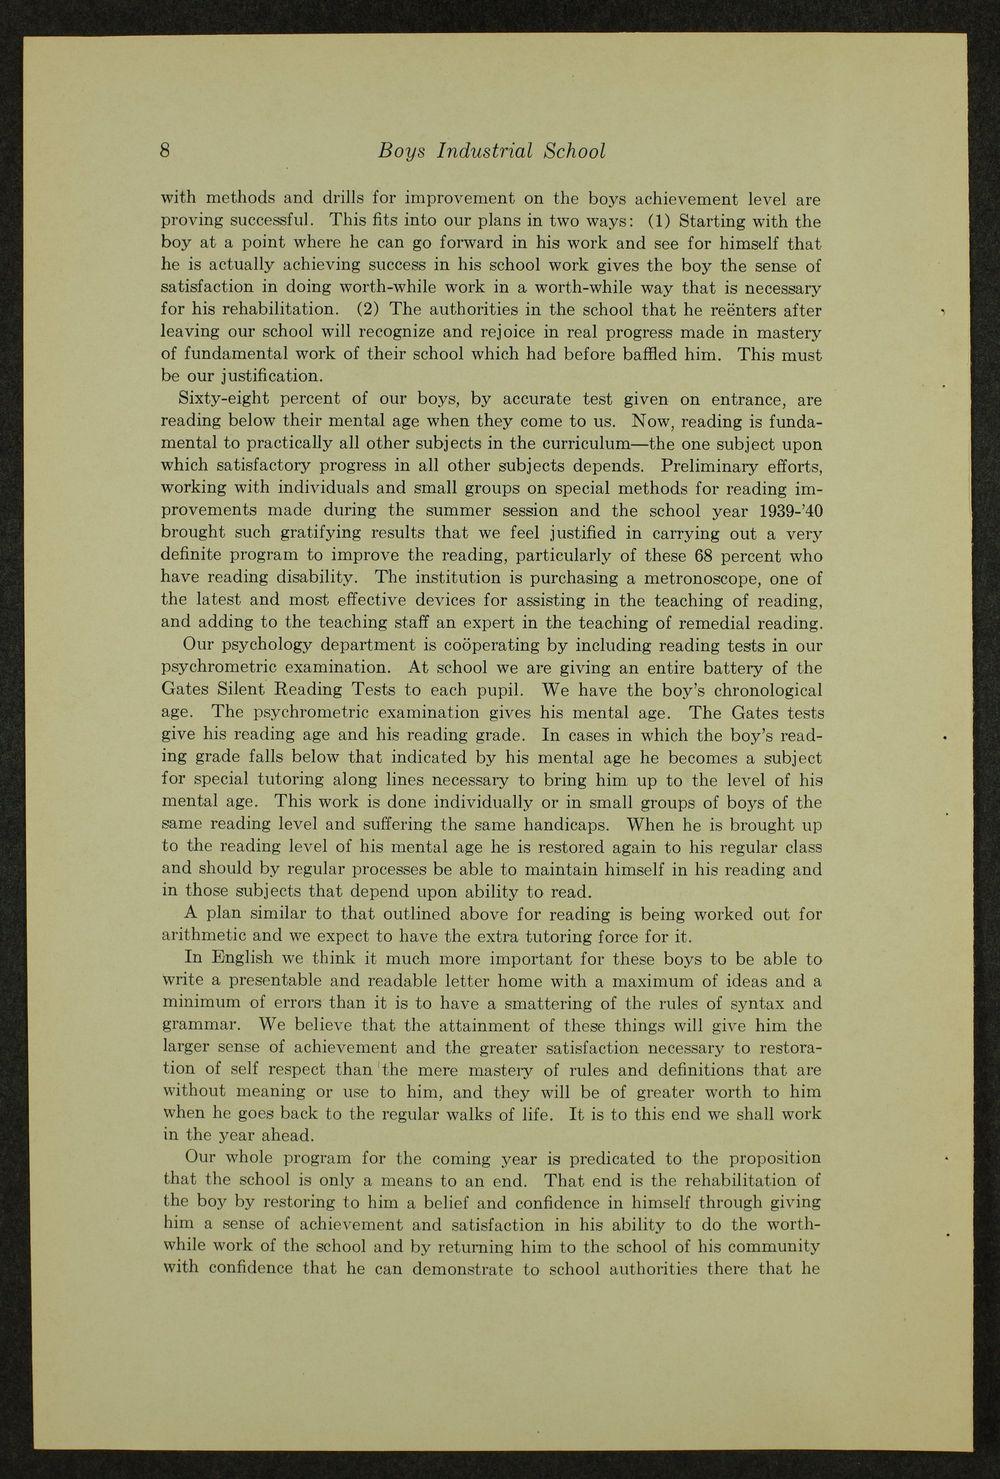 Biennial report of the Boys Industrial School, 1940 - 8